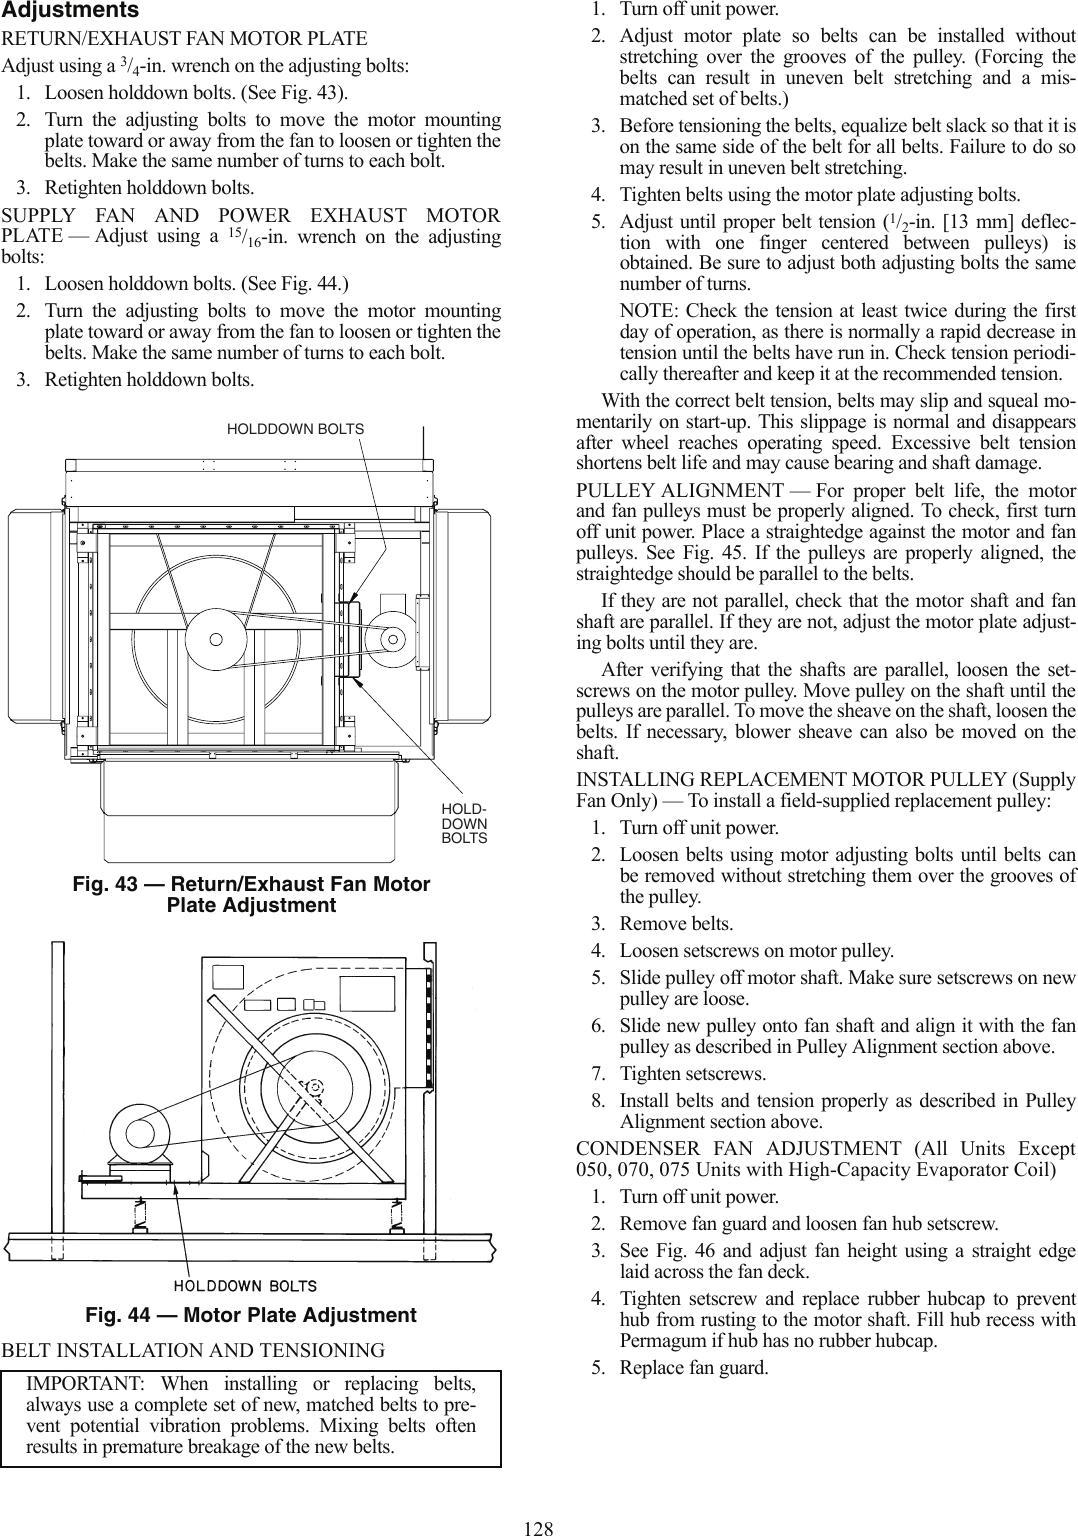 Carrier Weathermaster 48 50Z030 105 Users Manual 48_50z 5t